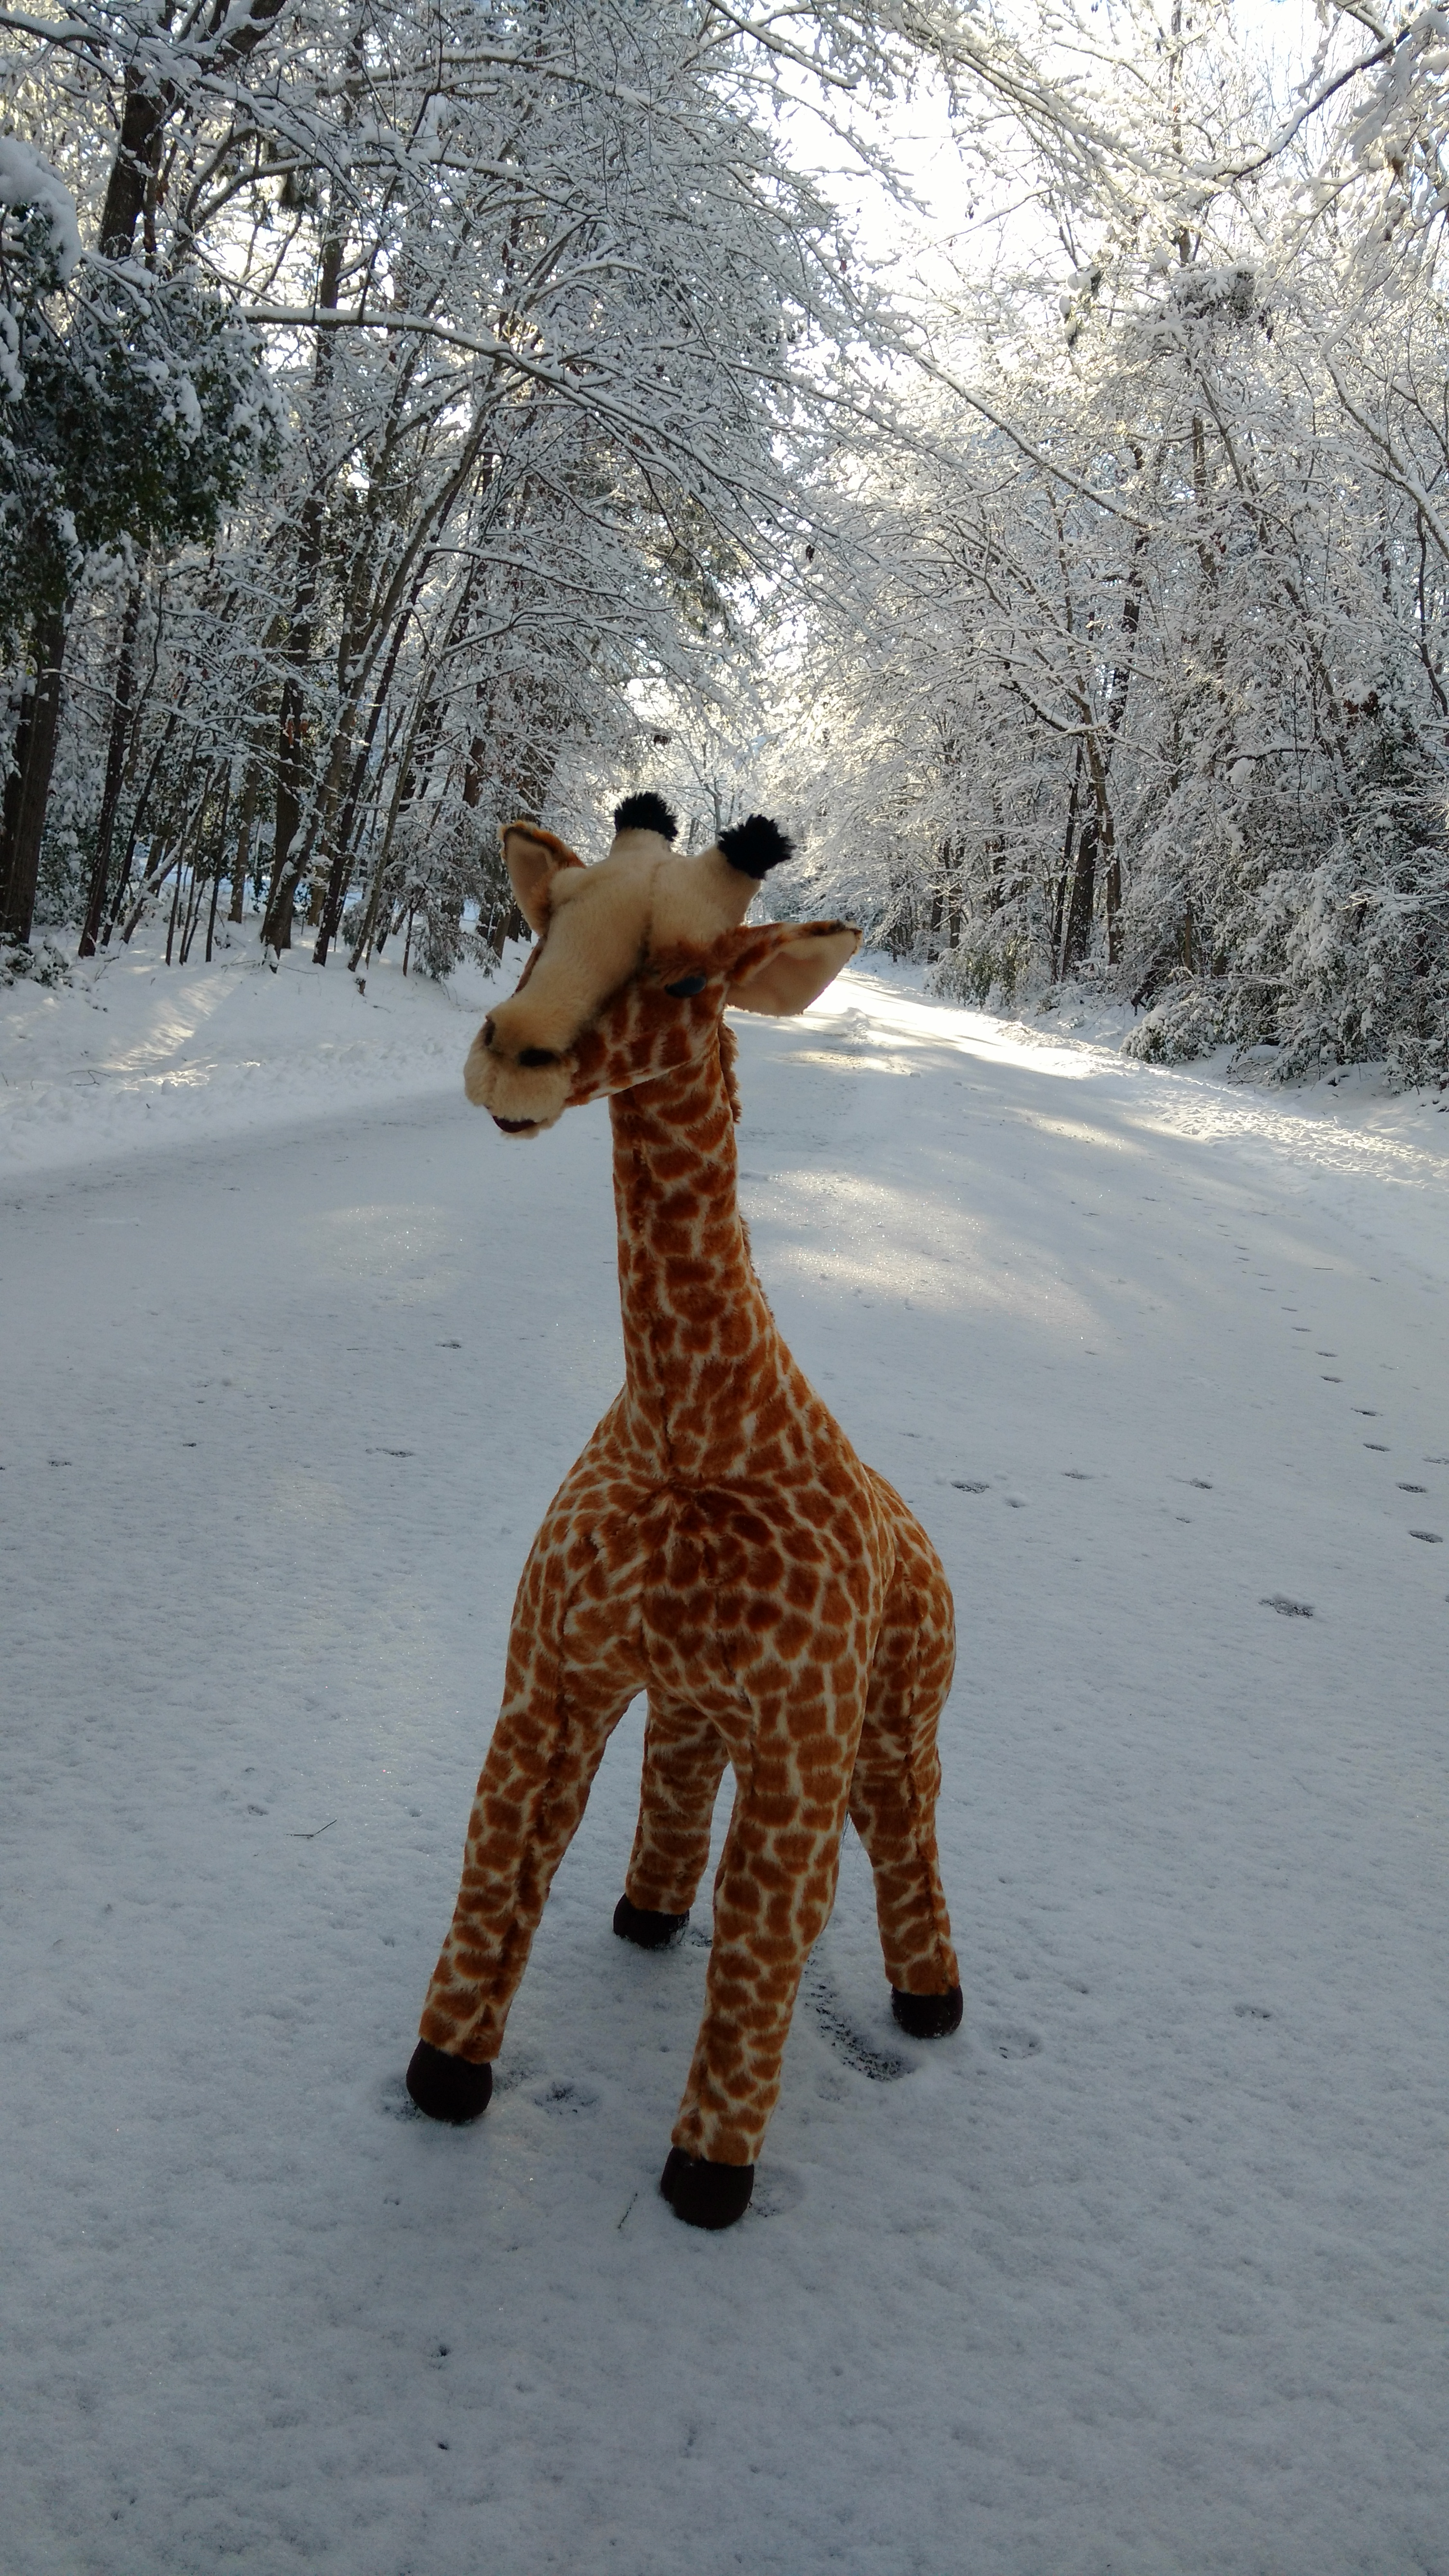 snowroadgiraffe